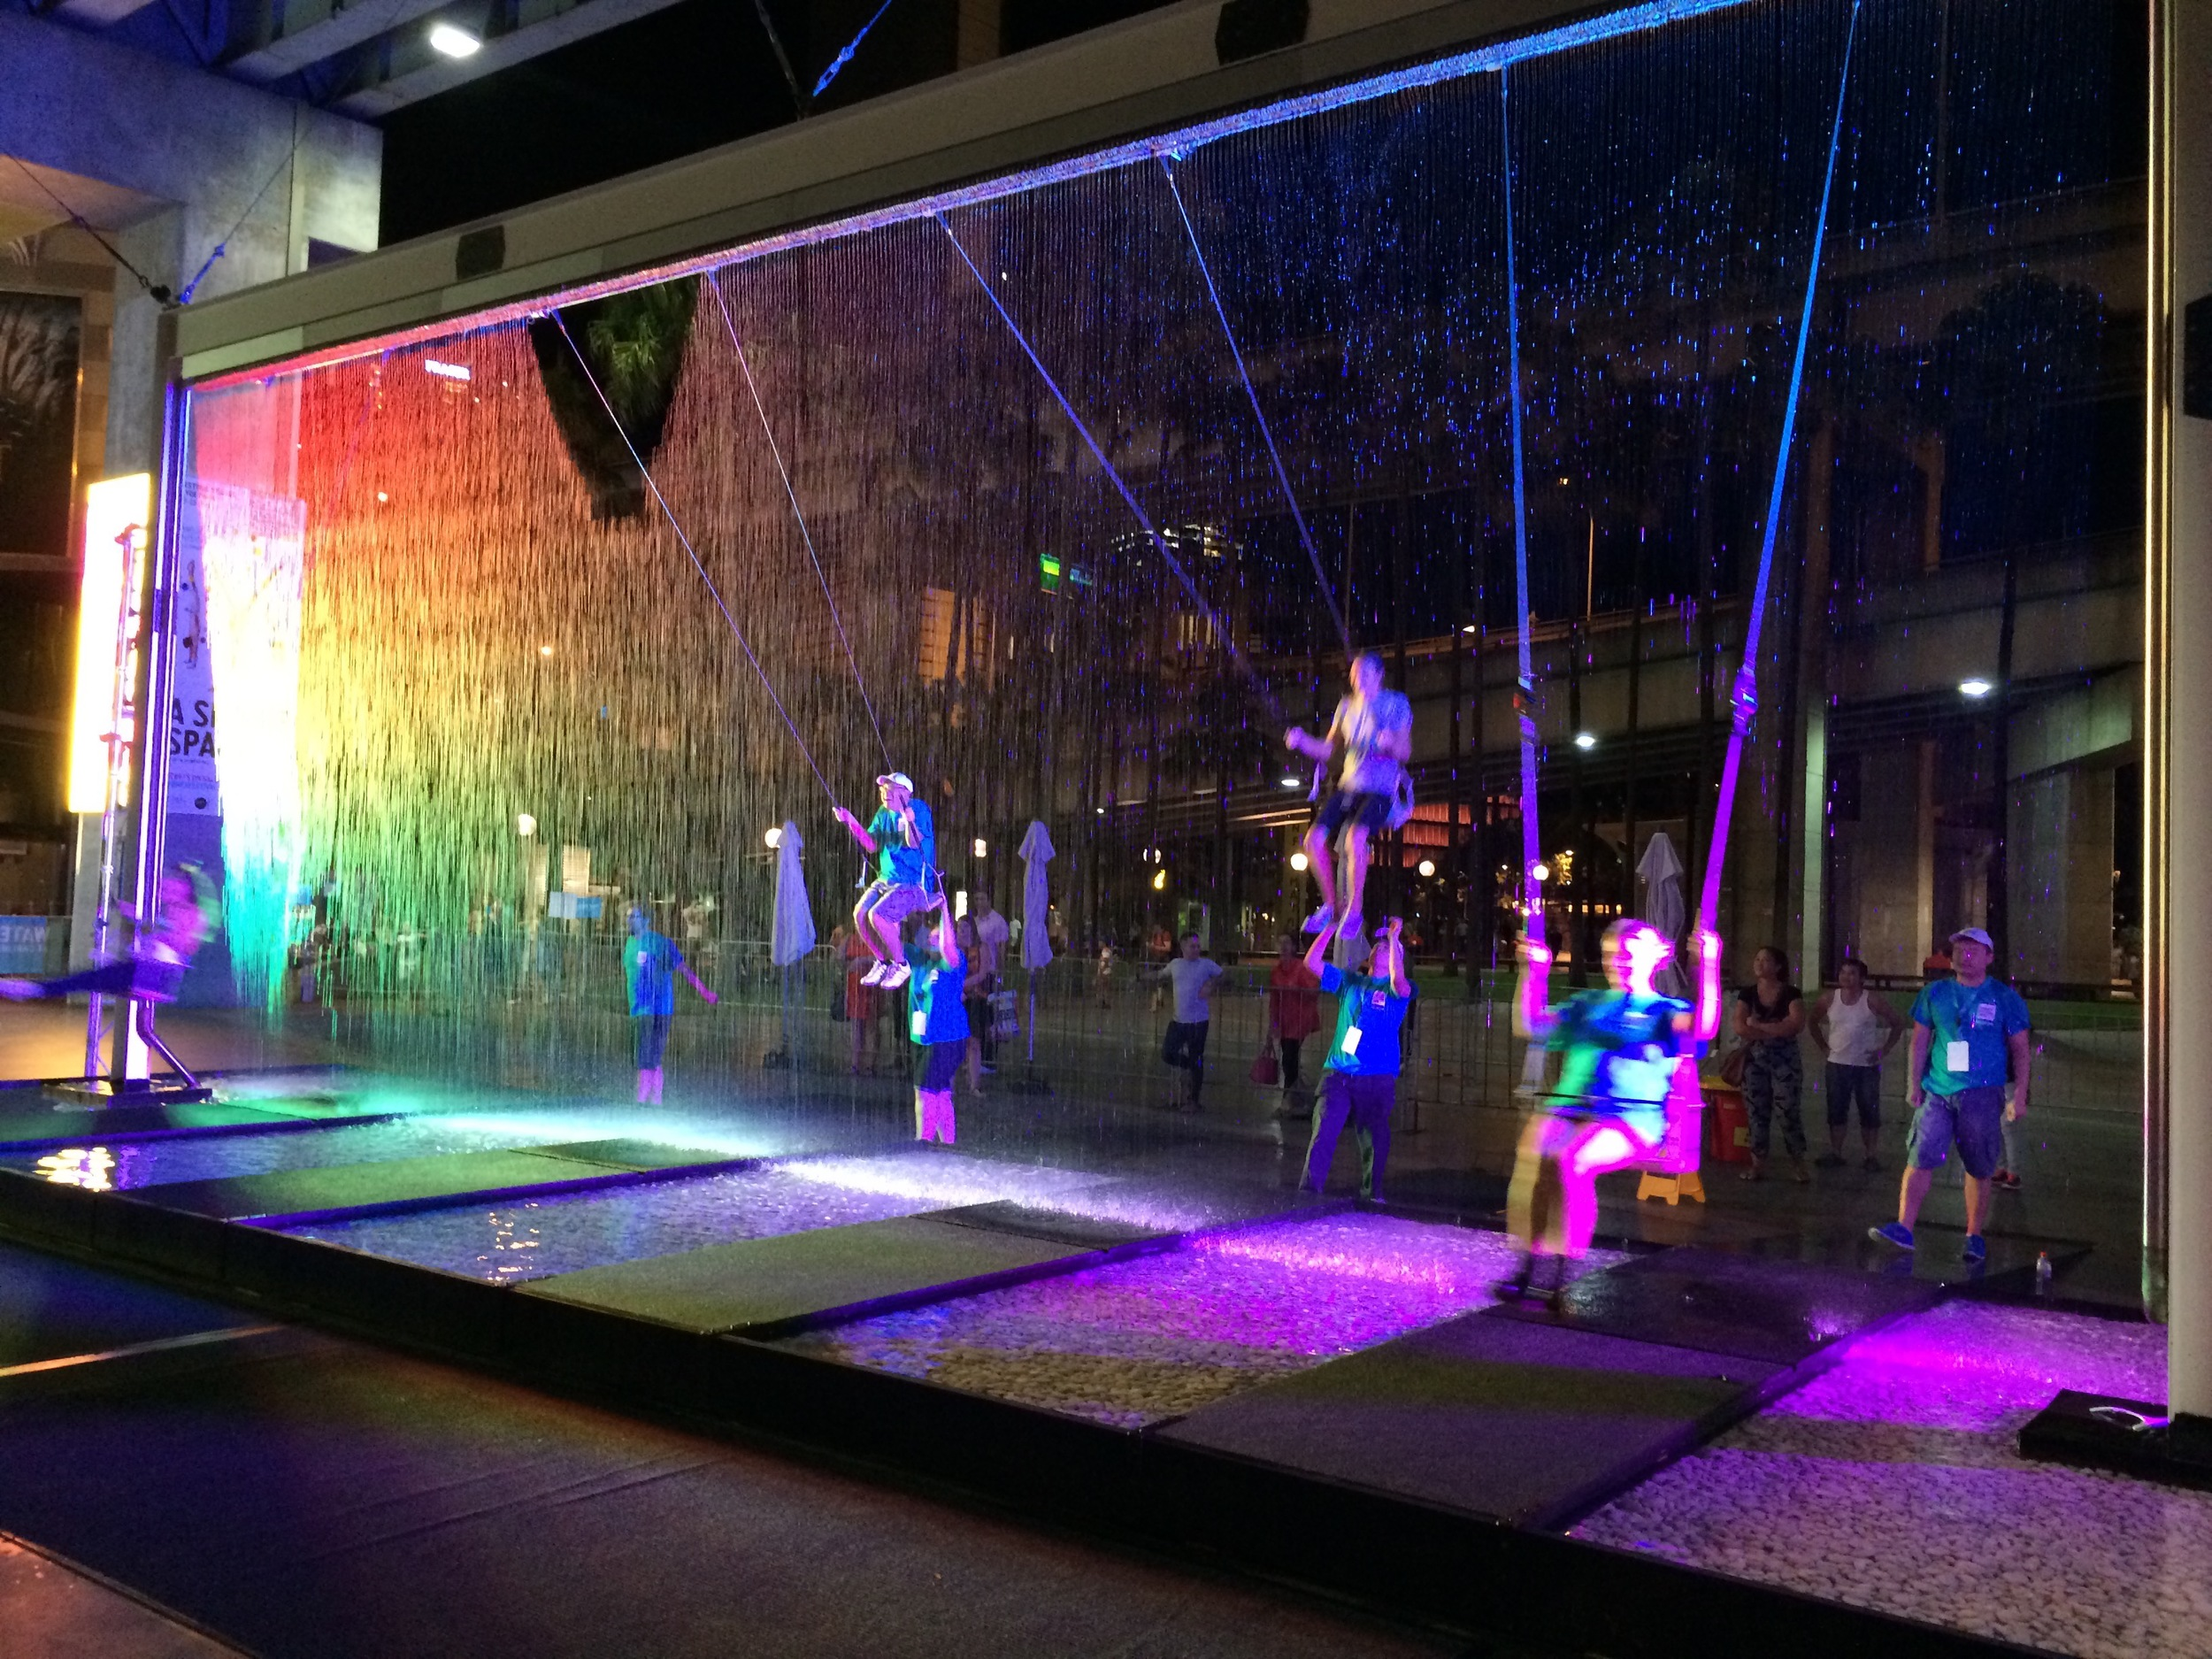 SydneyFestival_01.jpg